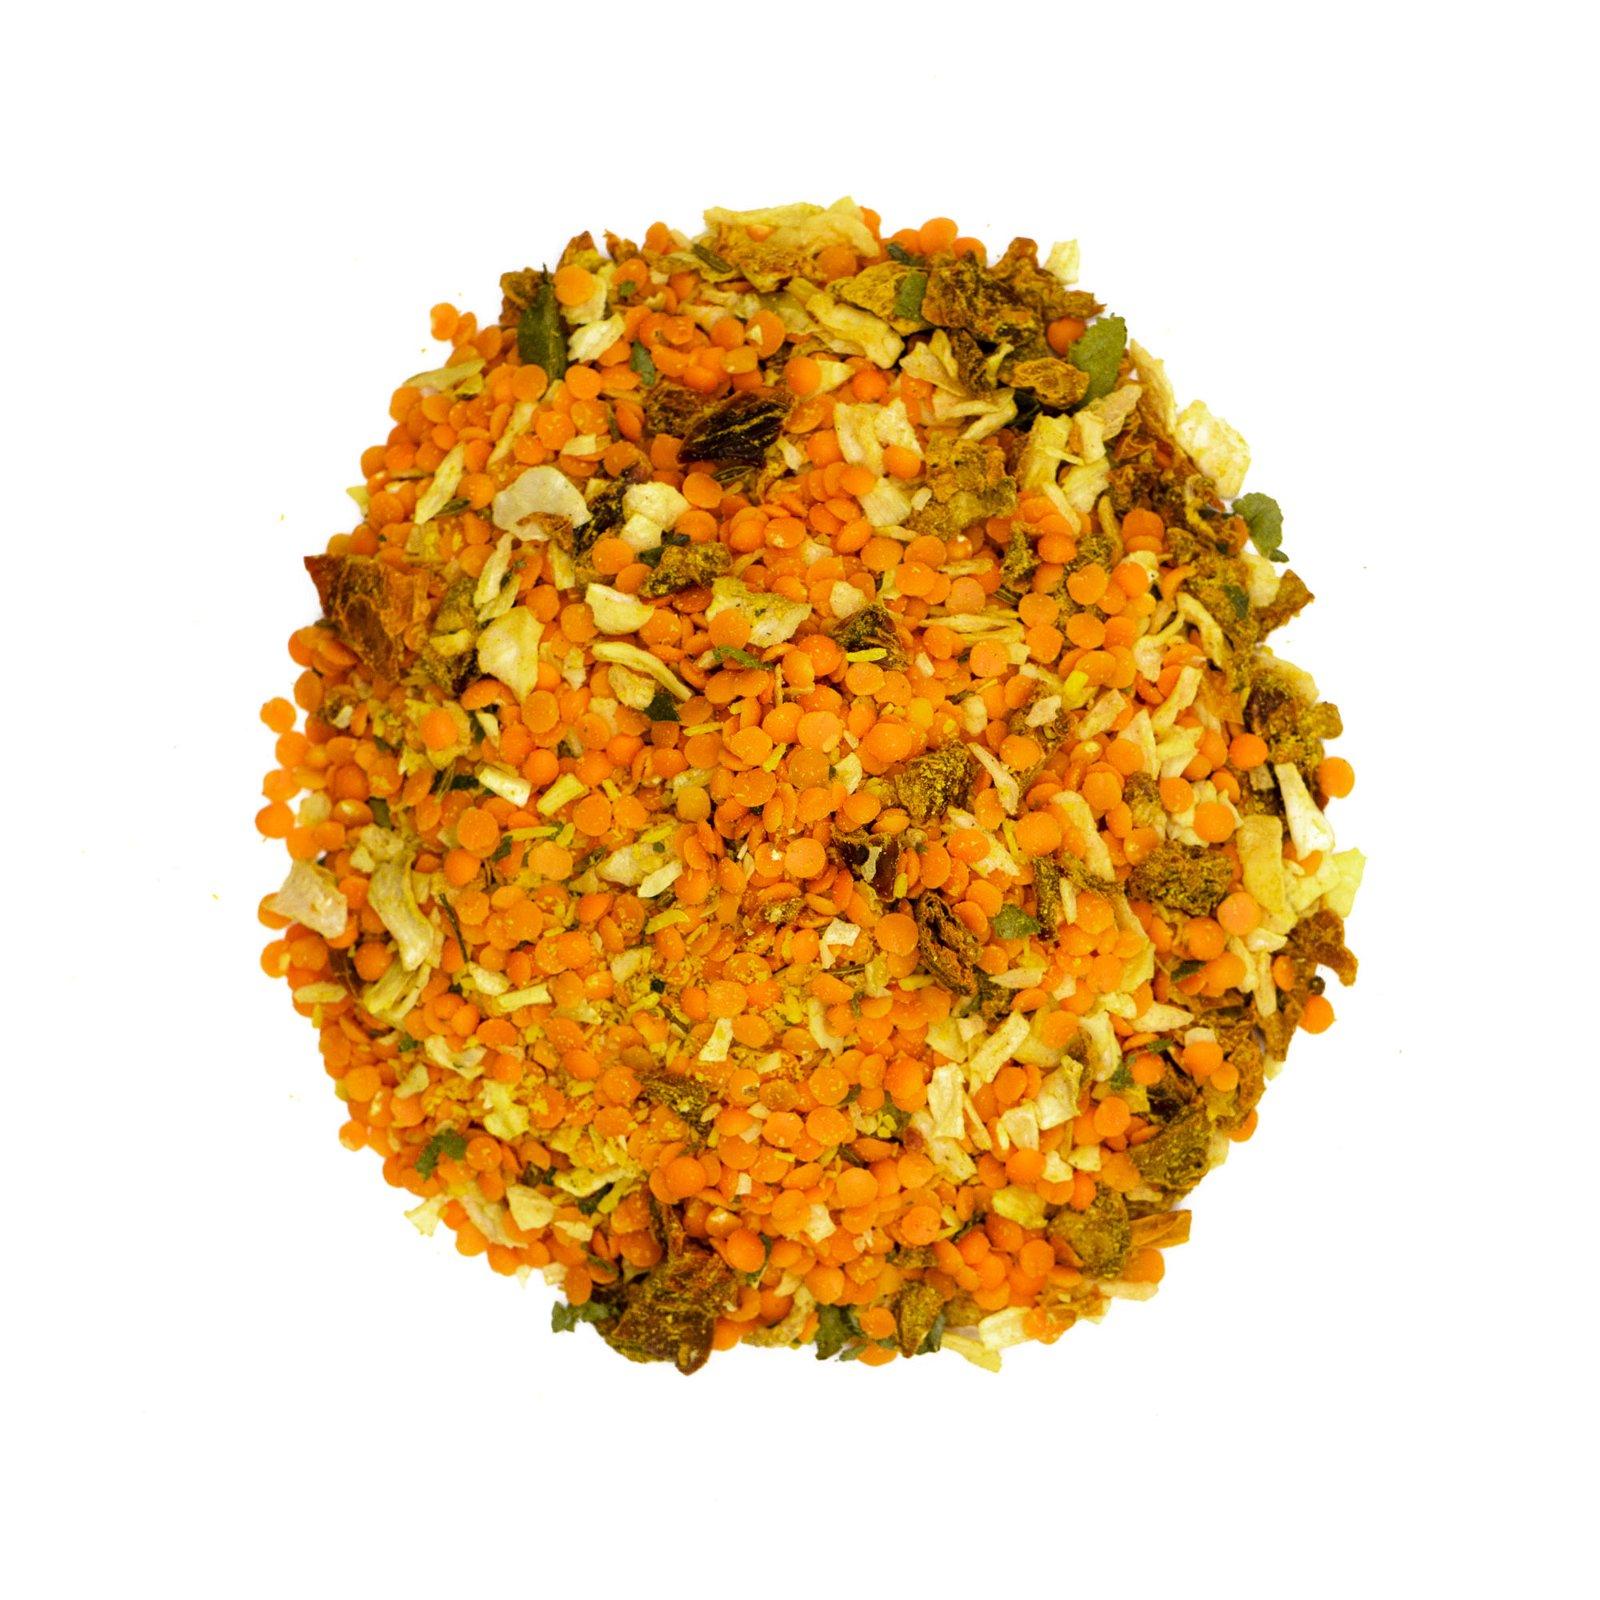 img-beendi-vrac-500g-dal-de-lentilles-corail-a-la-noix-de-coco-bio-en-vrac